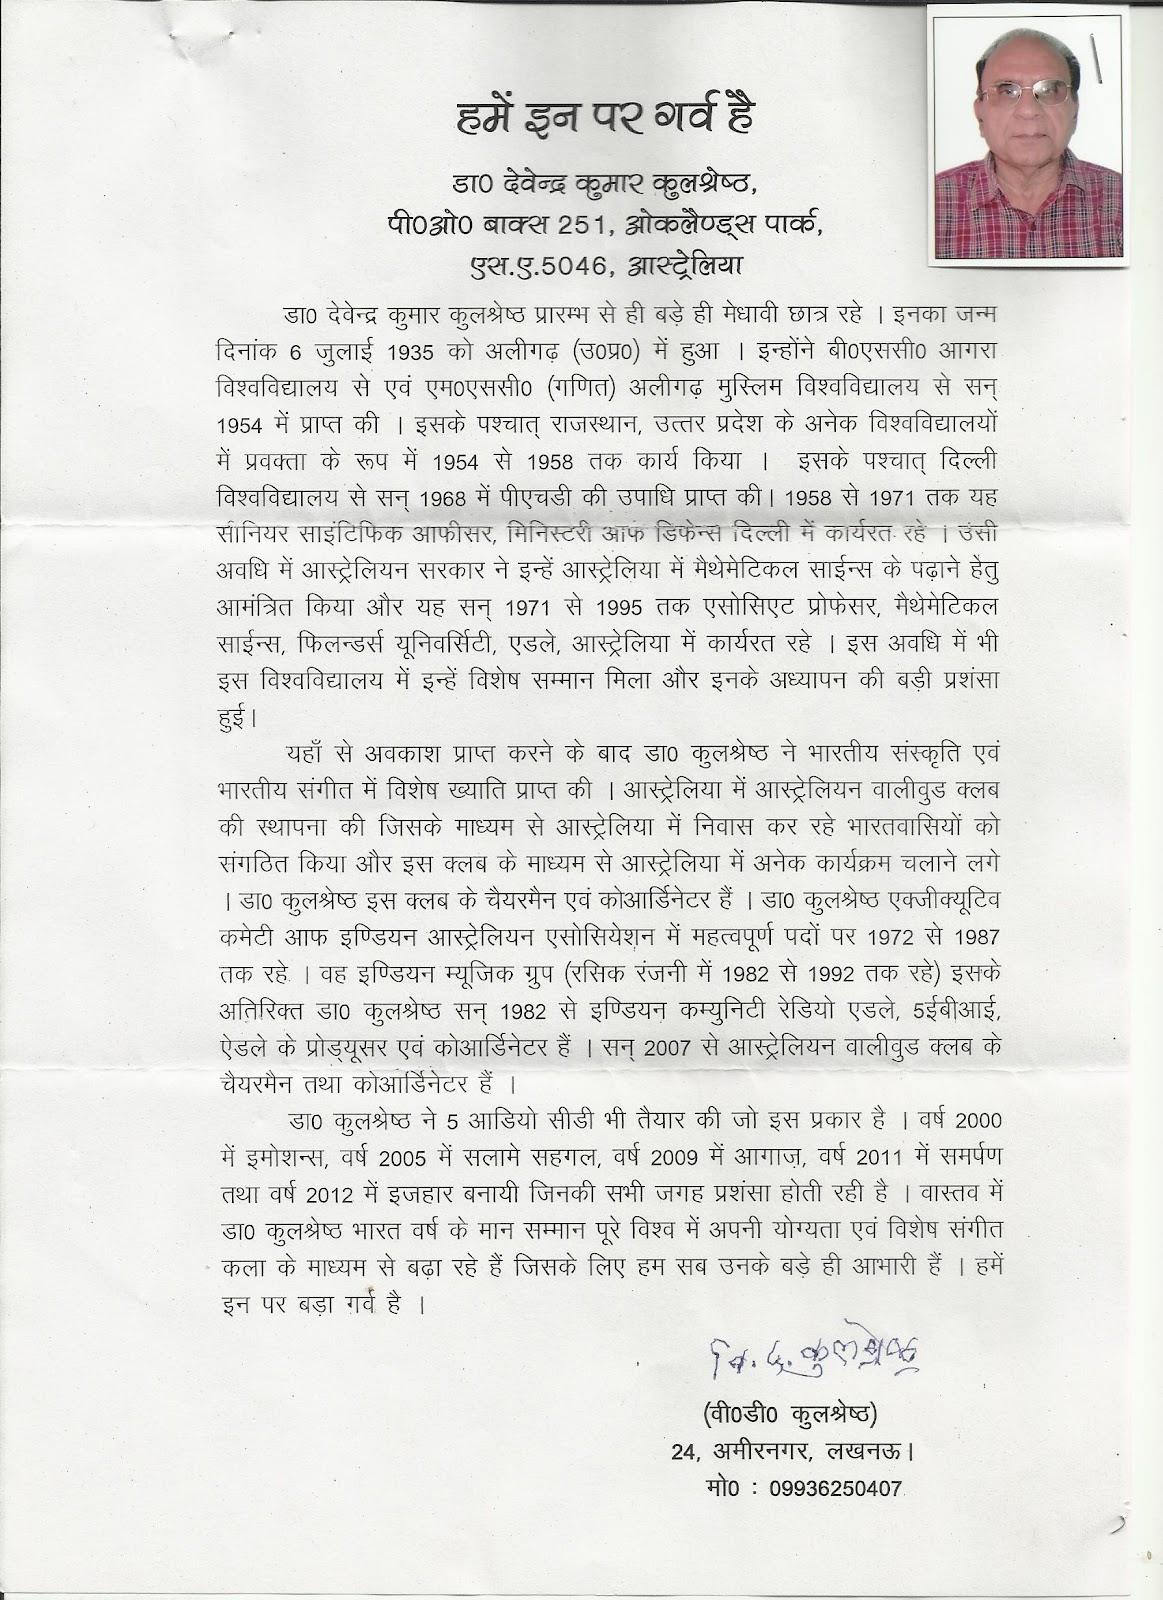 Devendra Kumar Kulshrestha